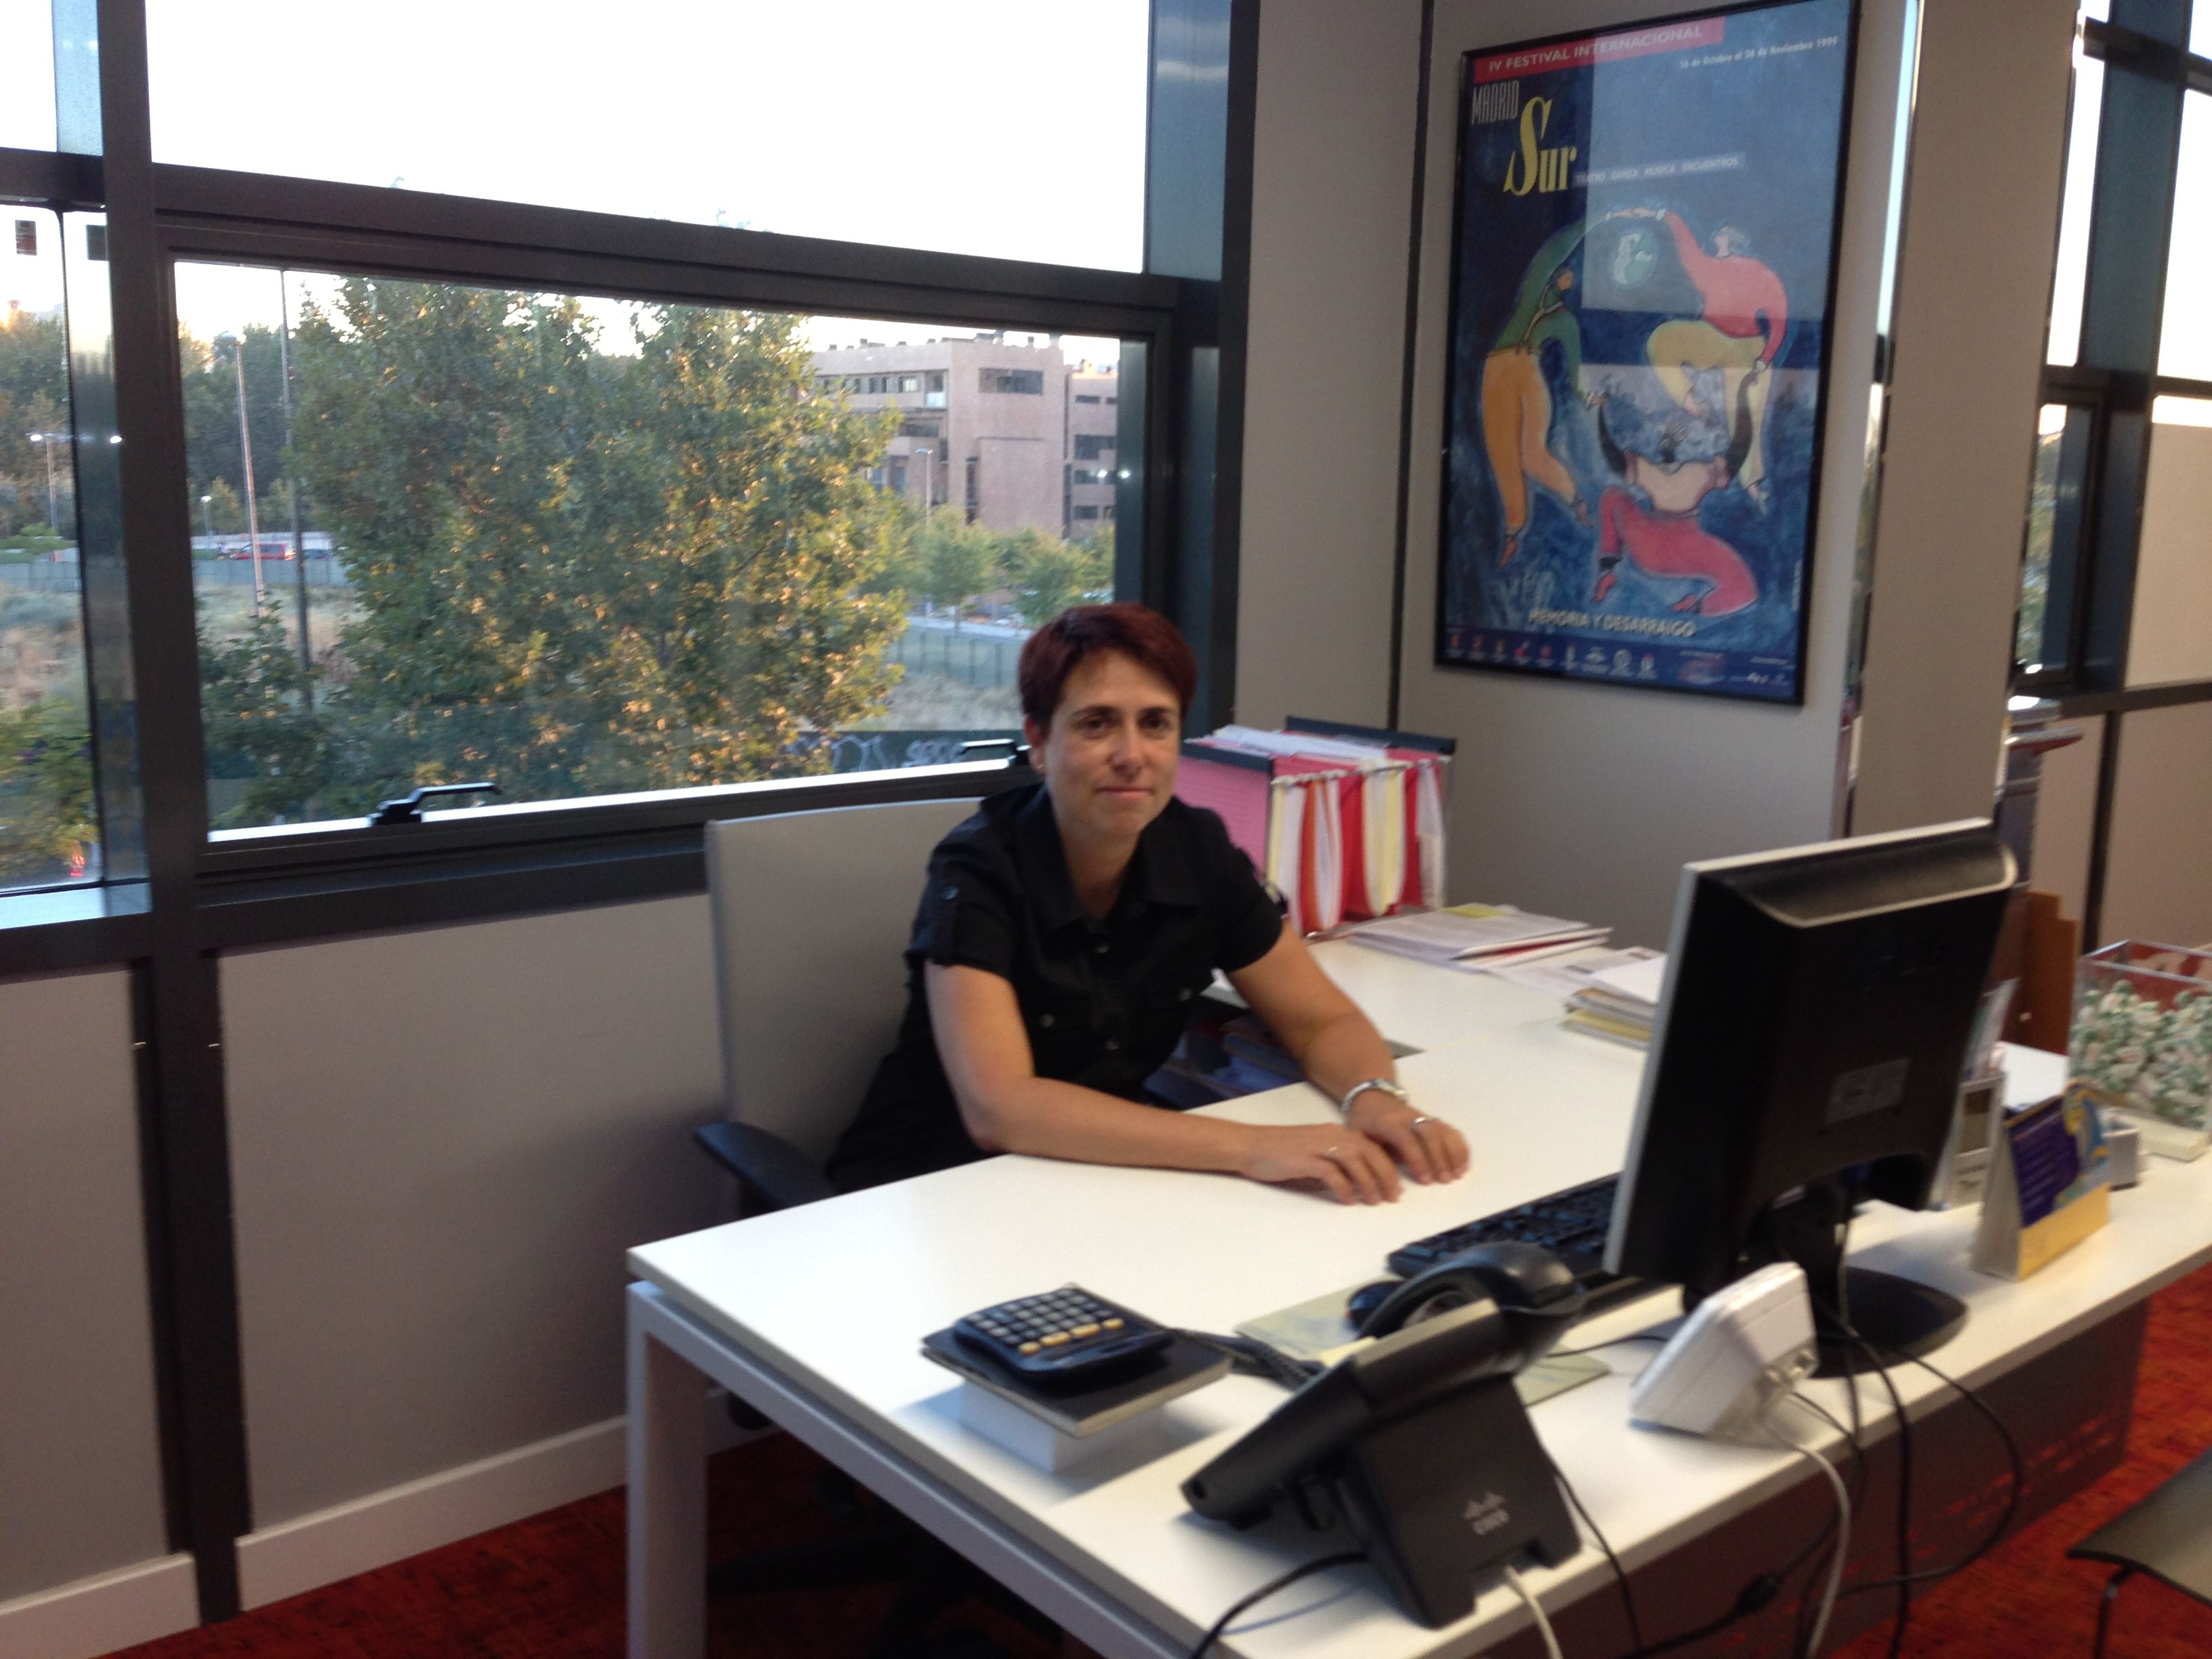 Asesoría contable: Servicios de Valdavia Asesores, S.L.P.